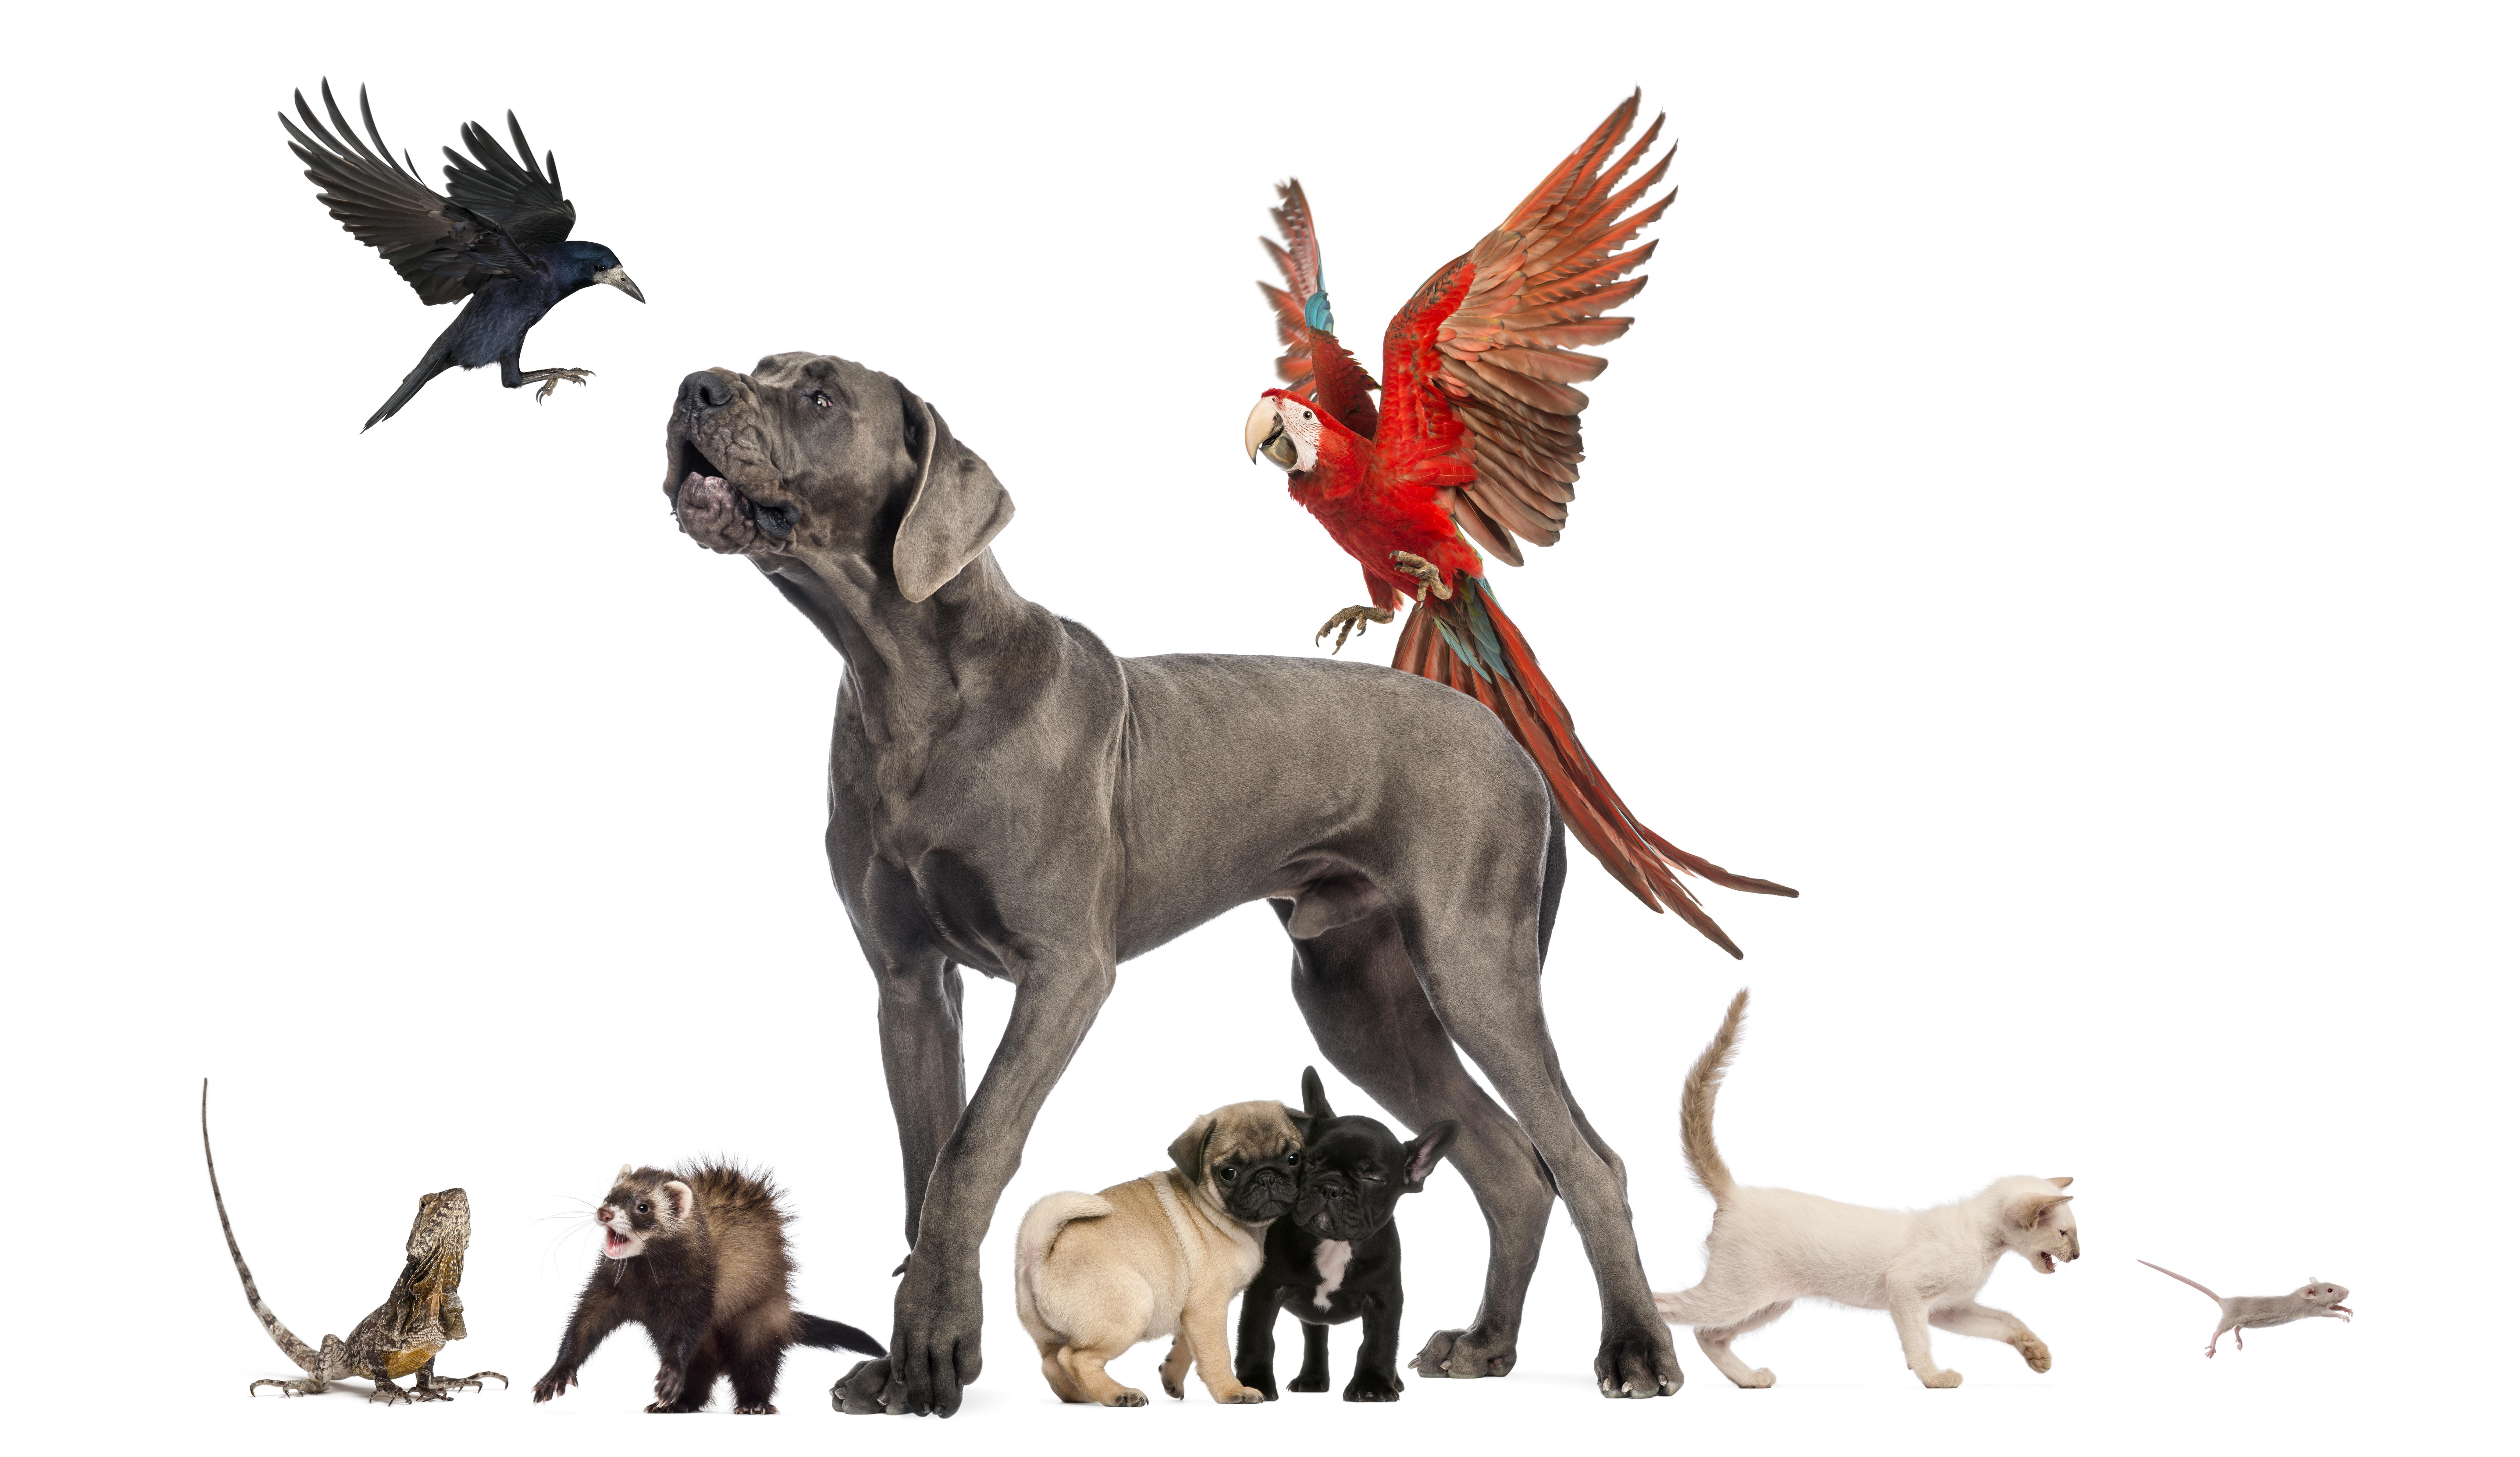 8k Animal Wallpaper Download: Pets 8k Ultra HD Wallpaper